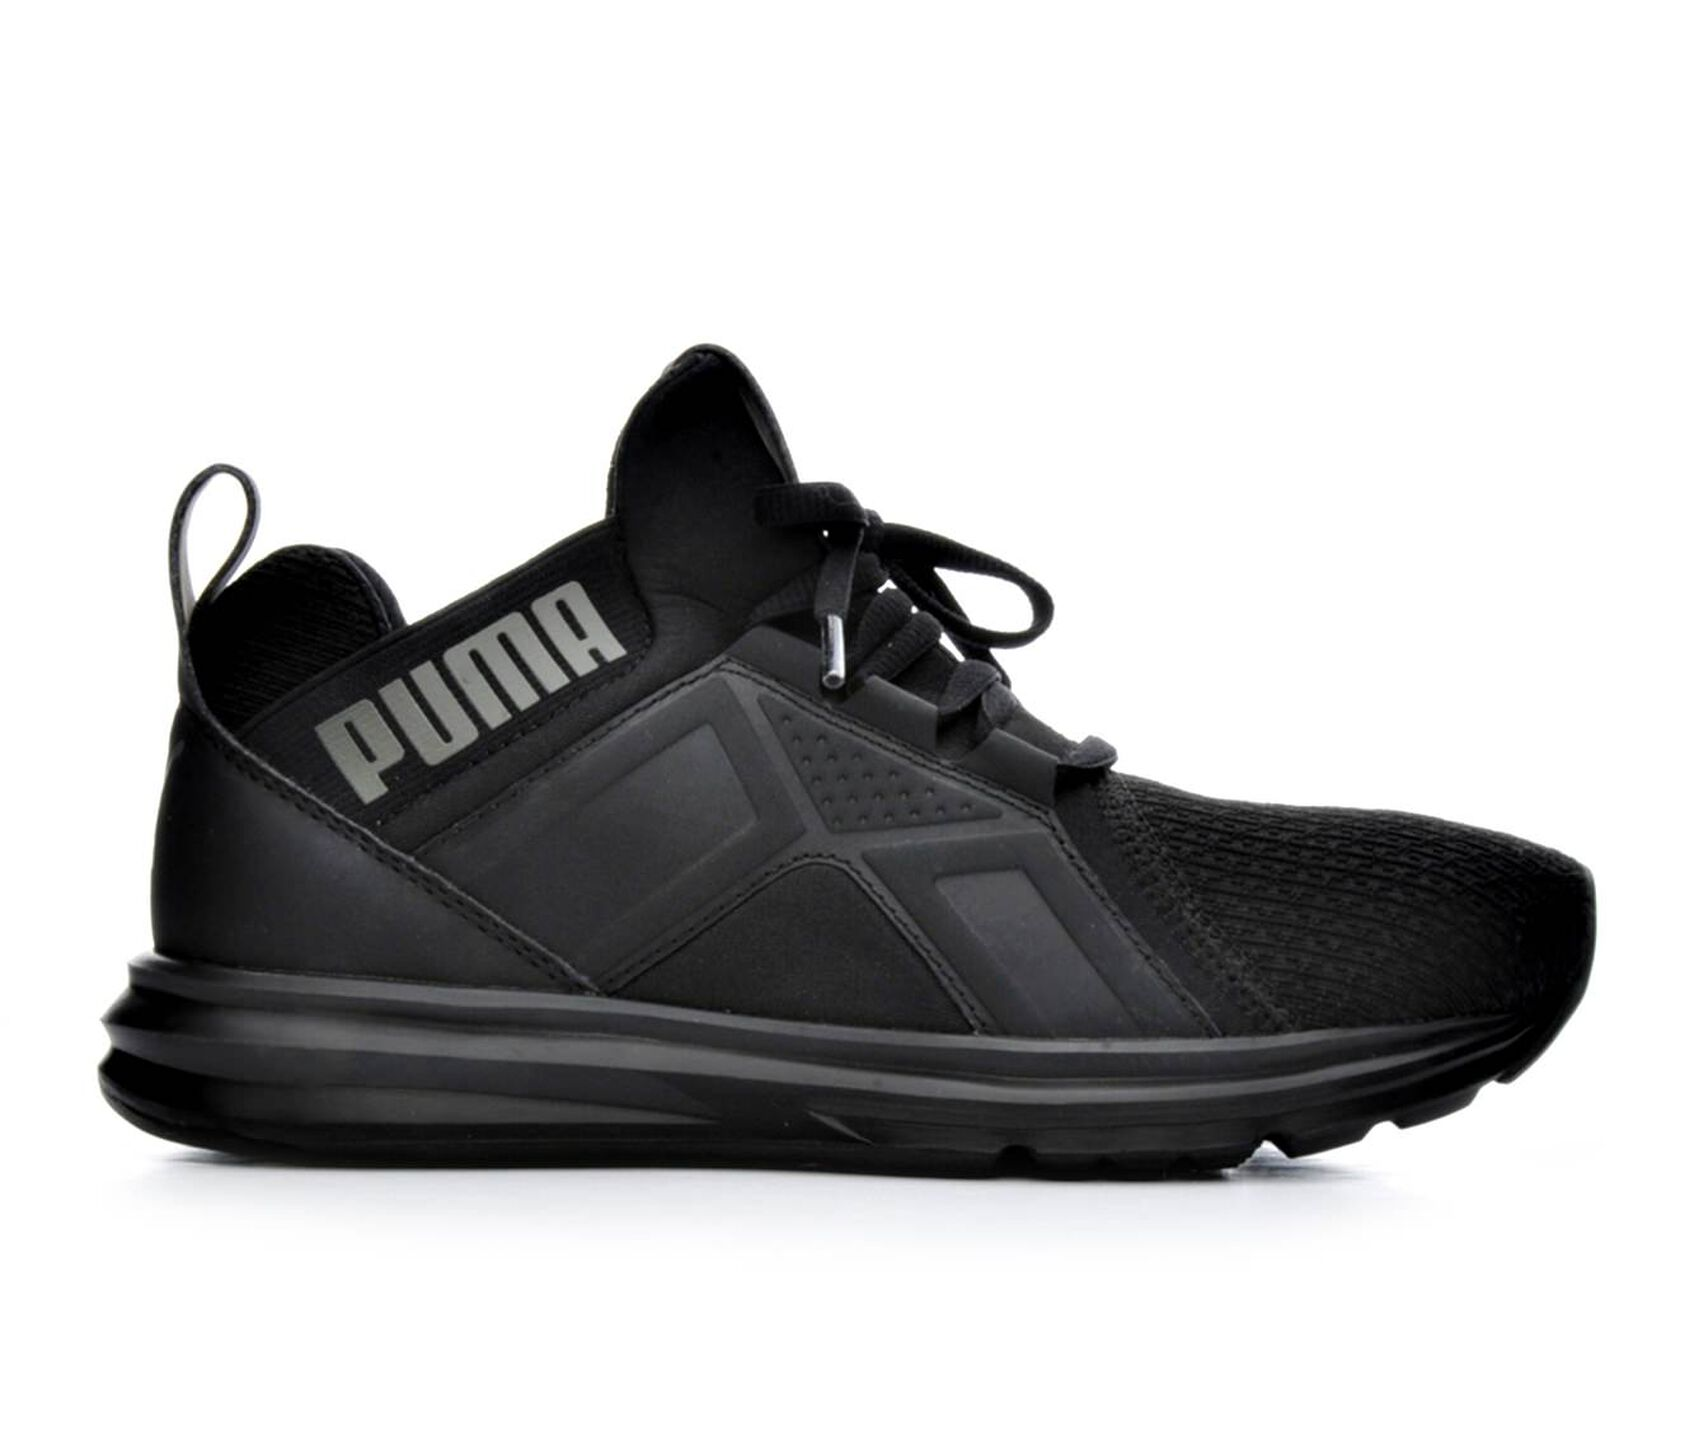 4753458a17 Boys' Puma Big Kid Enzo Jr High Top Slip-On Sneakers | Shoe Carnival